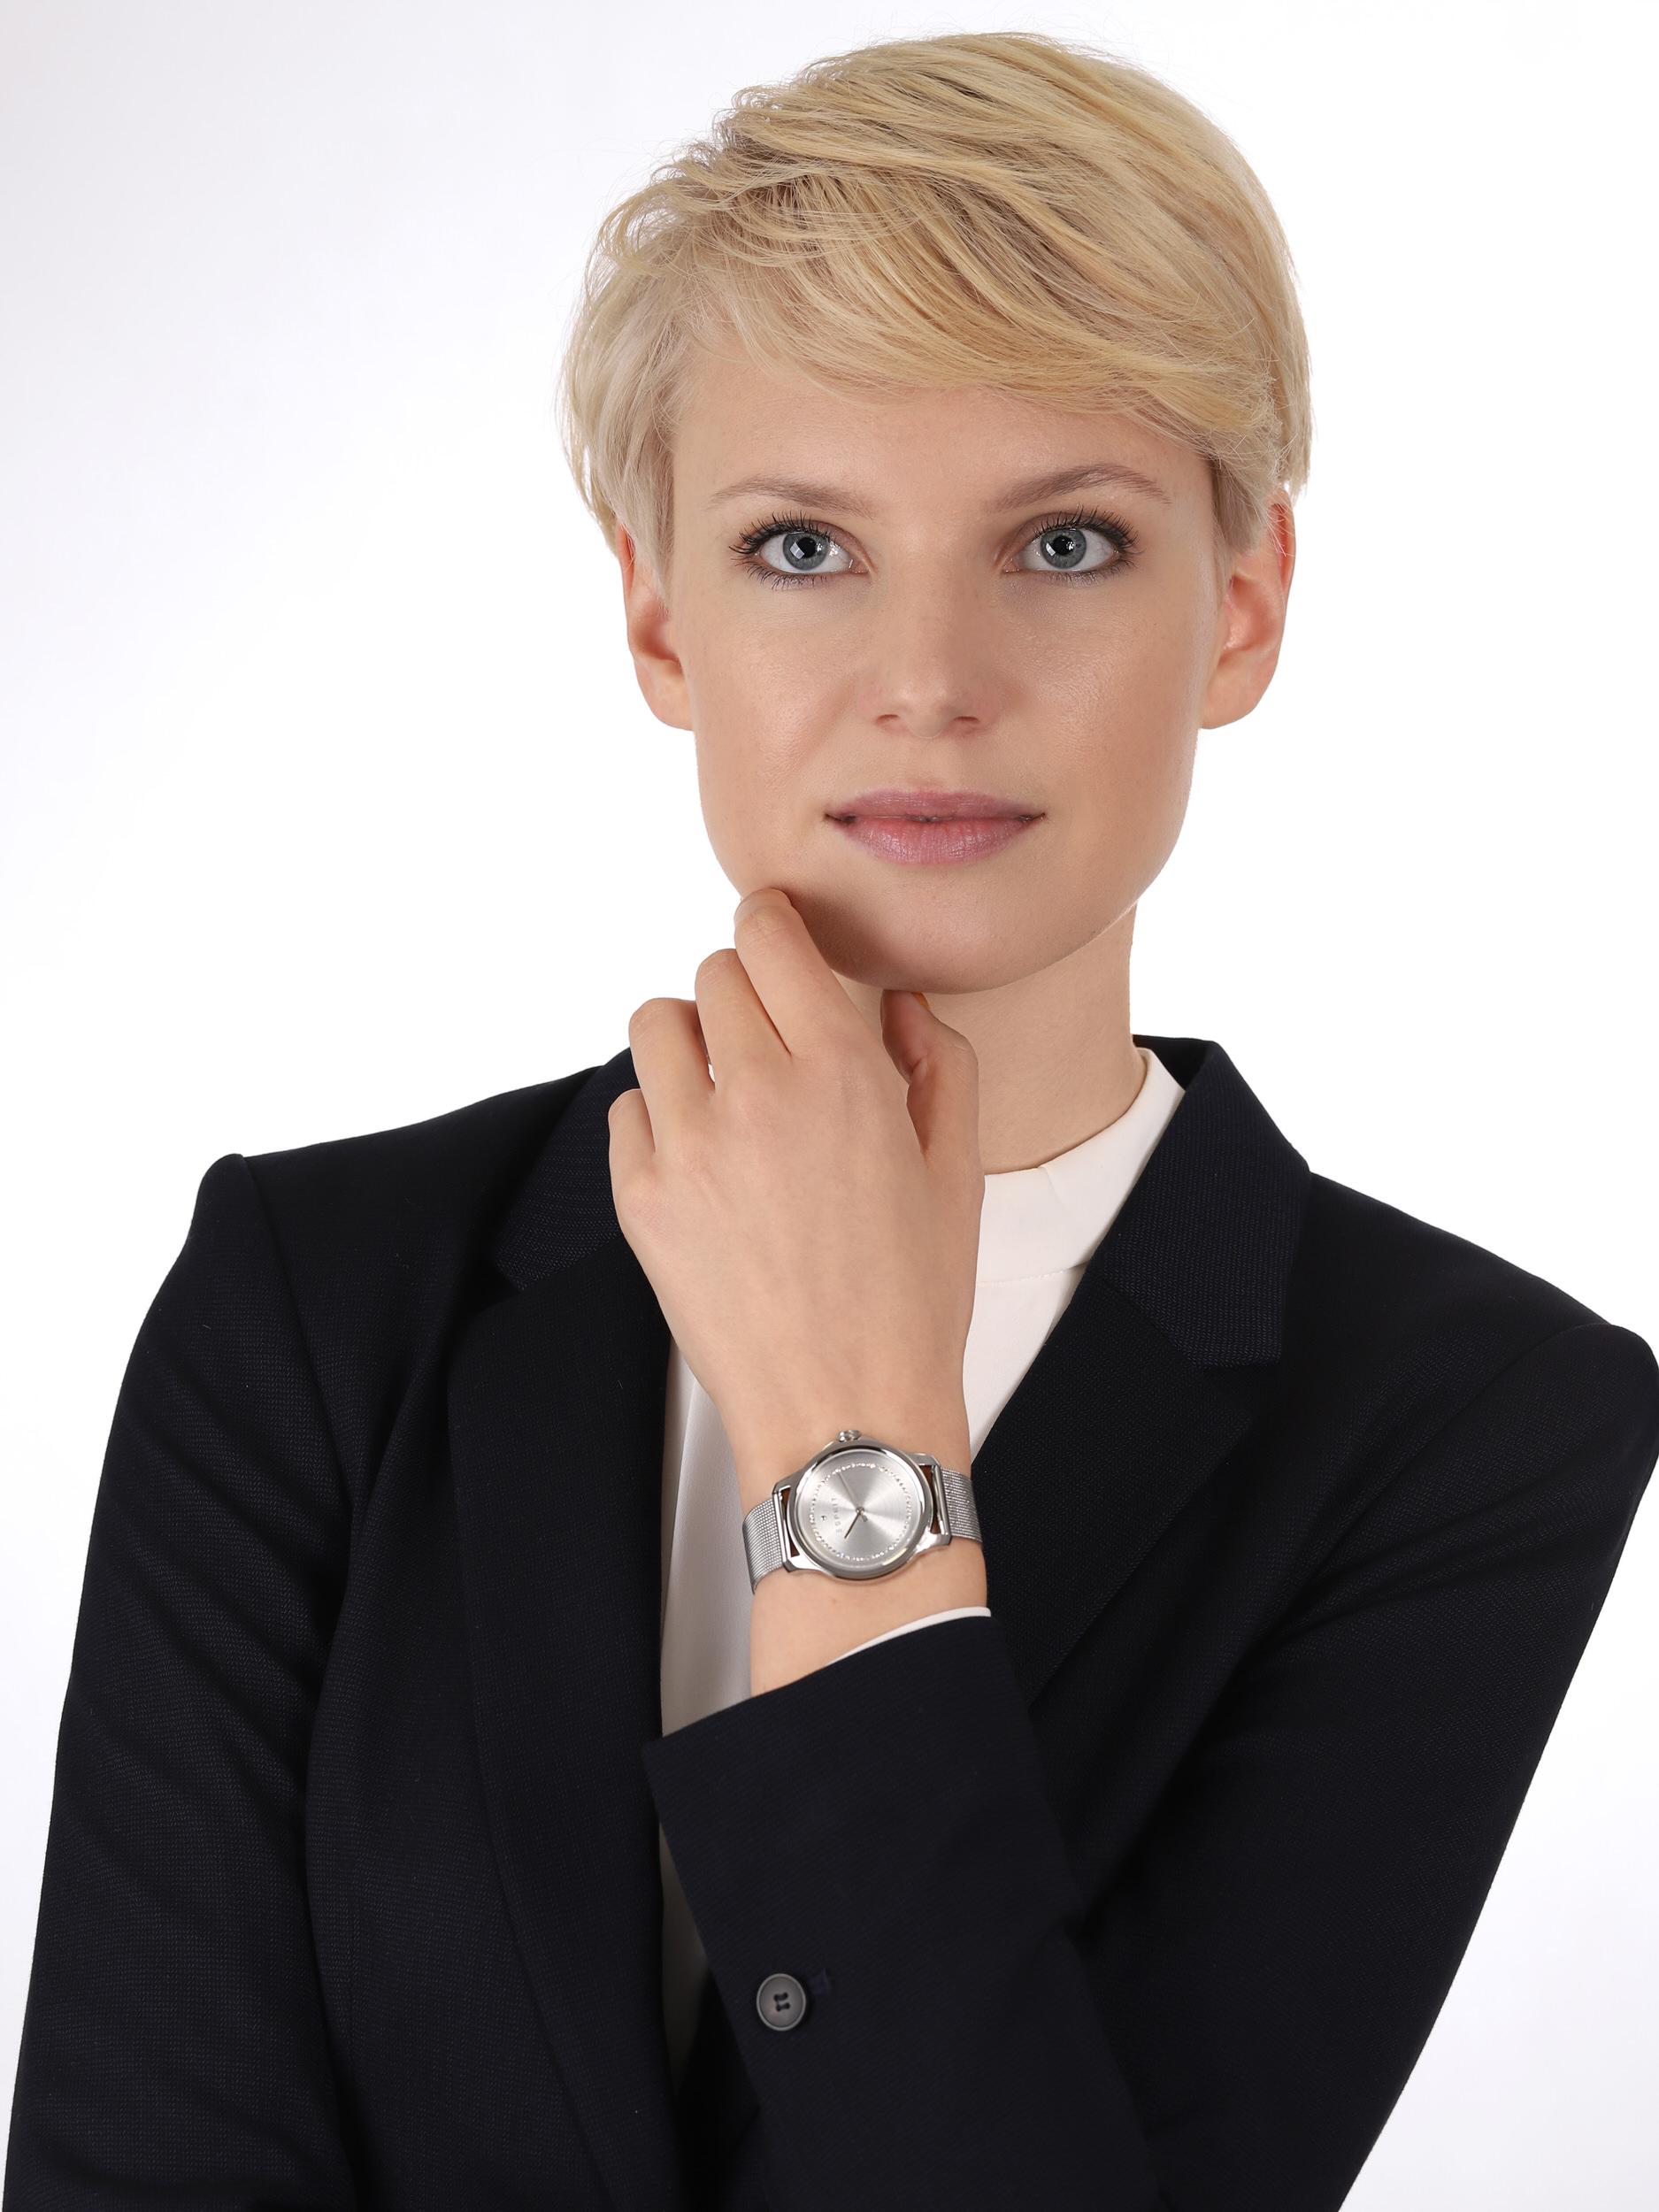 zegarek Esprit ES1L147M0055 kwarcowy damski Damskie